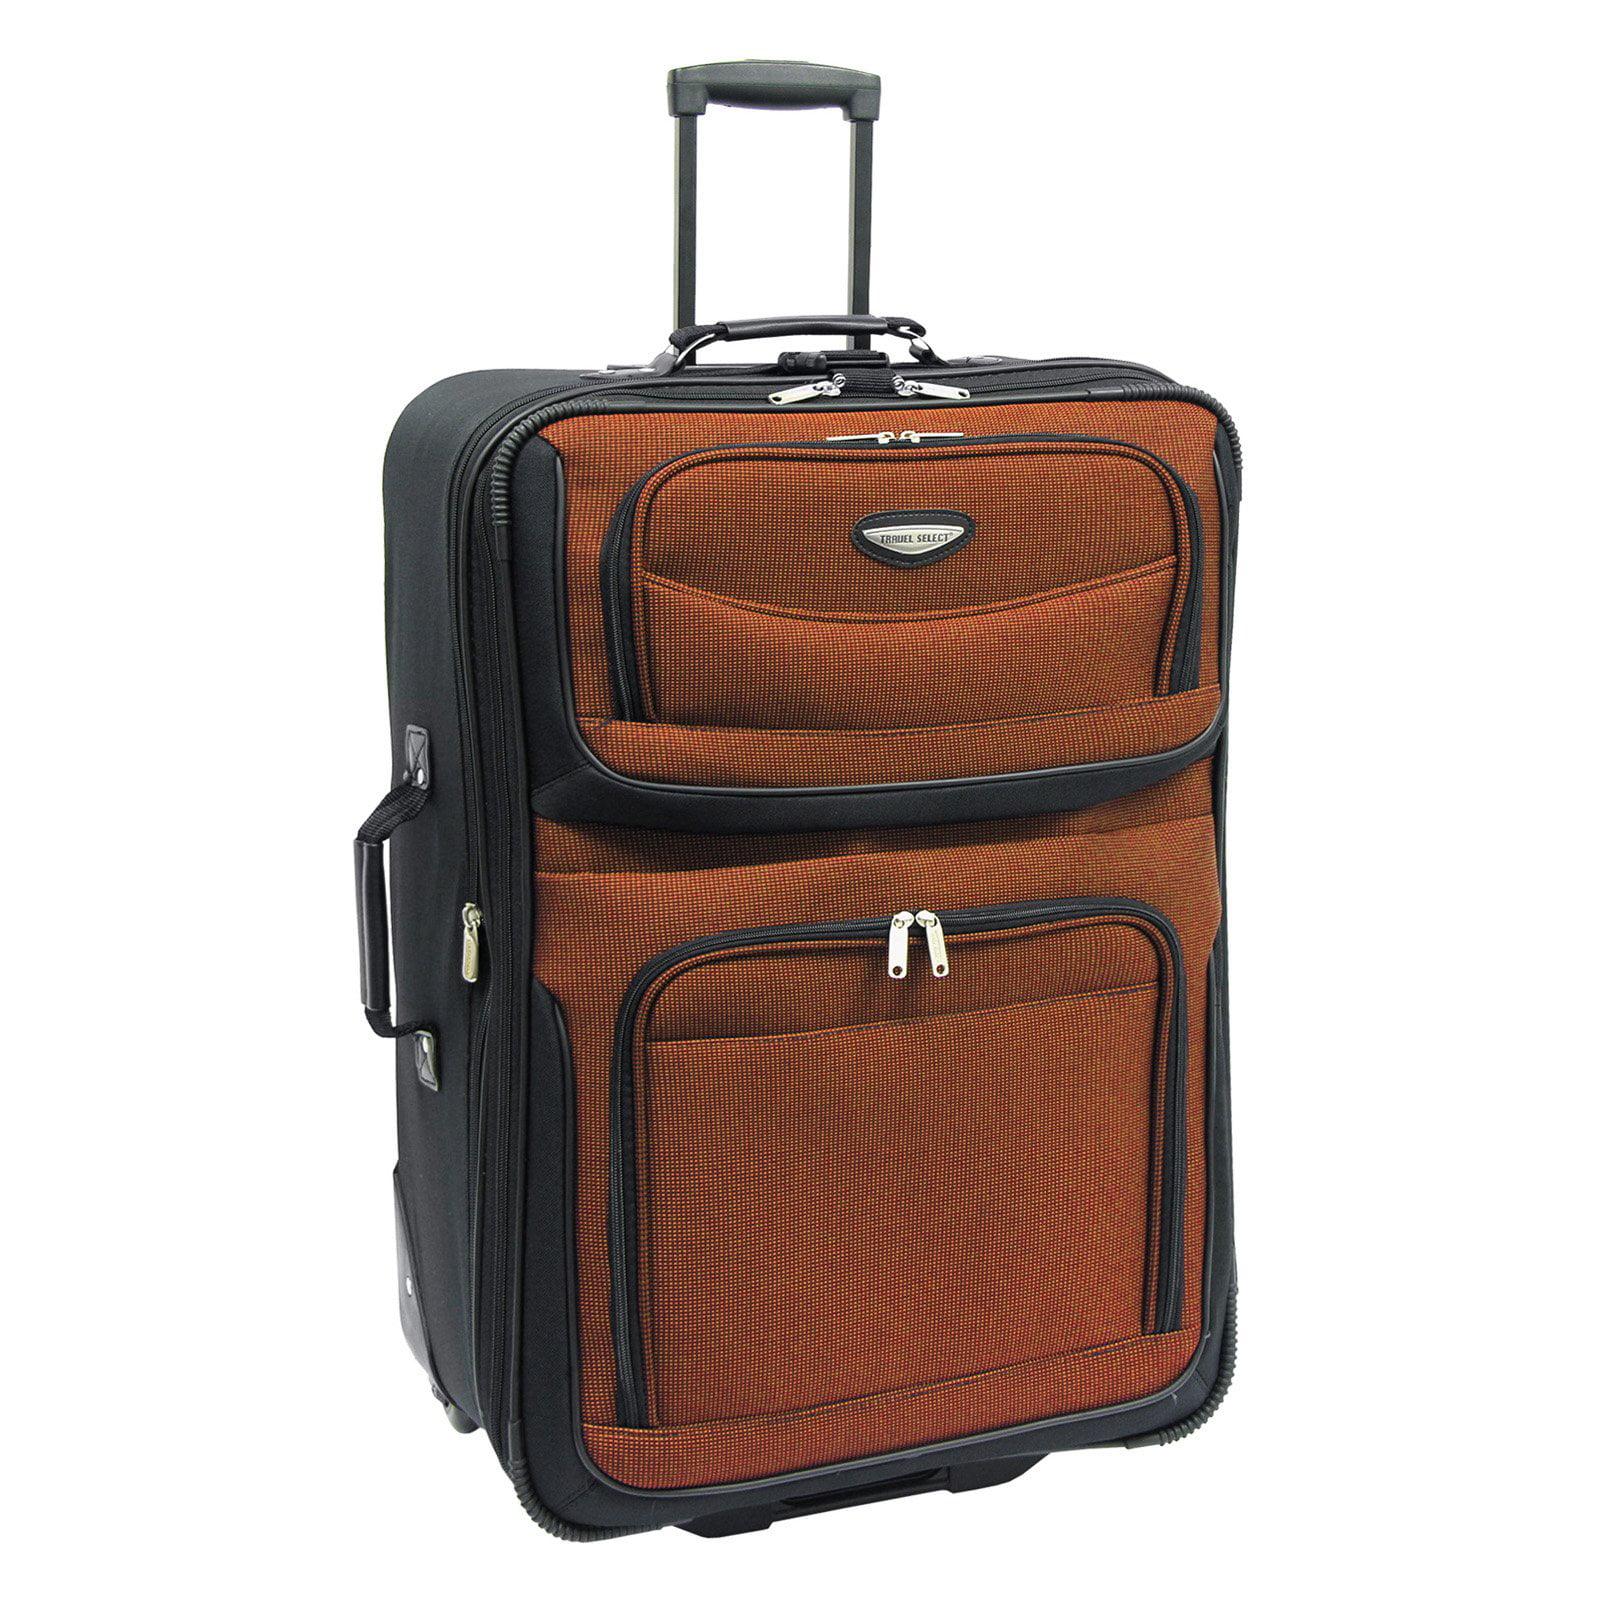 Four Wheel Suitcases